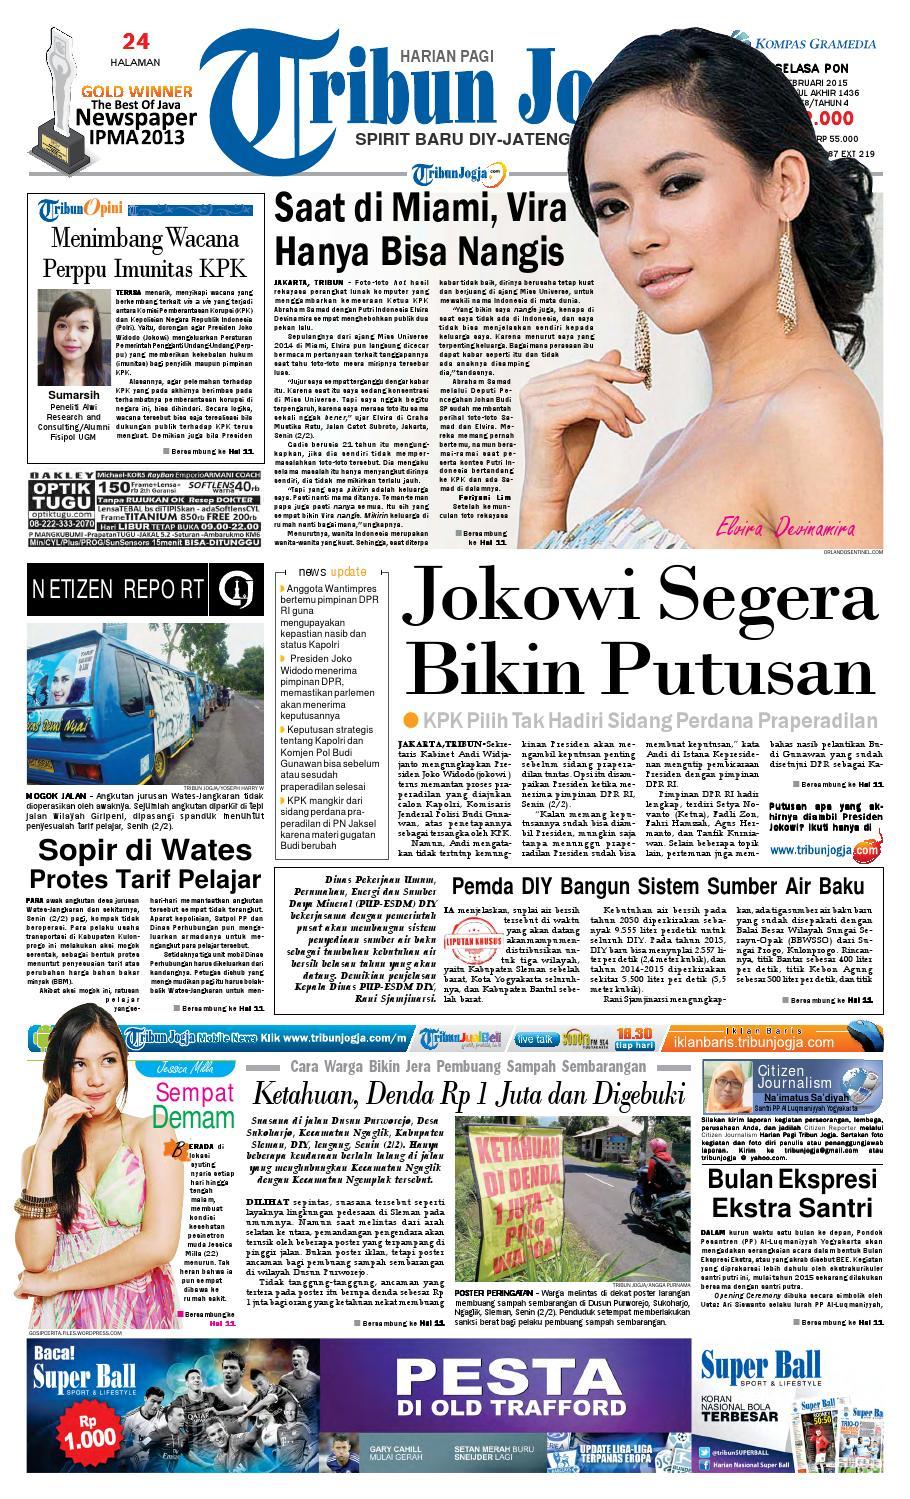 Tribunjogja 03 02 2015 By Tribun Jogja Issuu Produk Ukm Bumn Ci Embul Tahu Bakso 250g Original Free Ongkir Depok Ampamp Jakarta